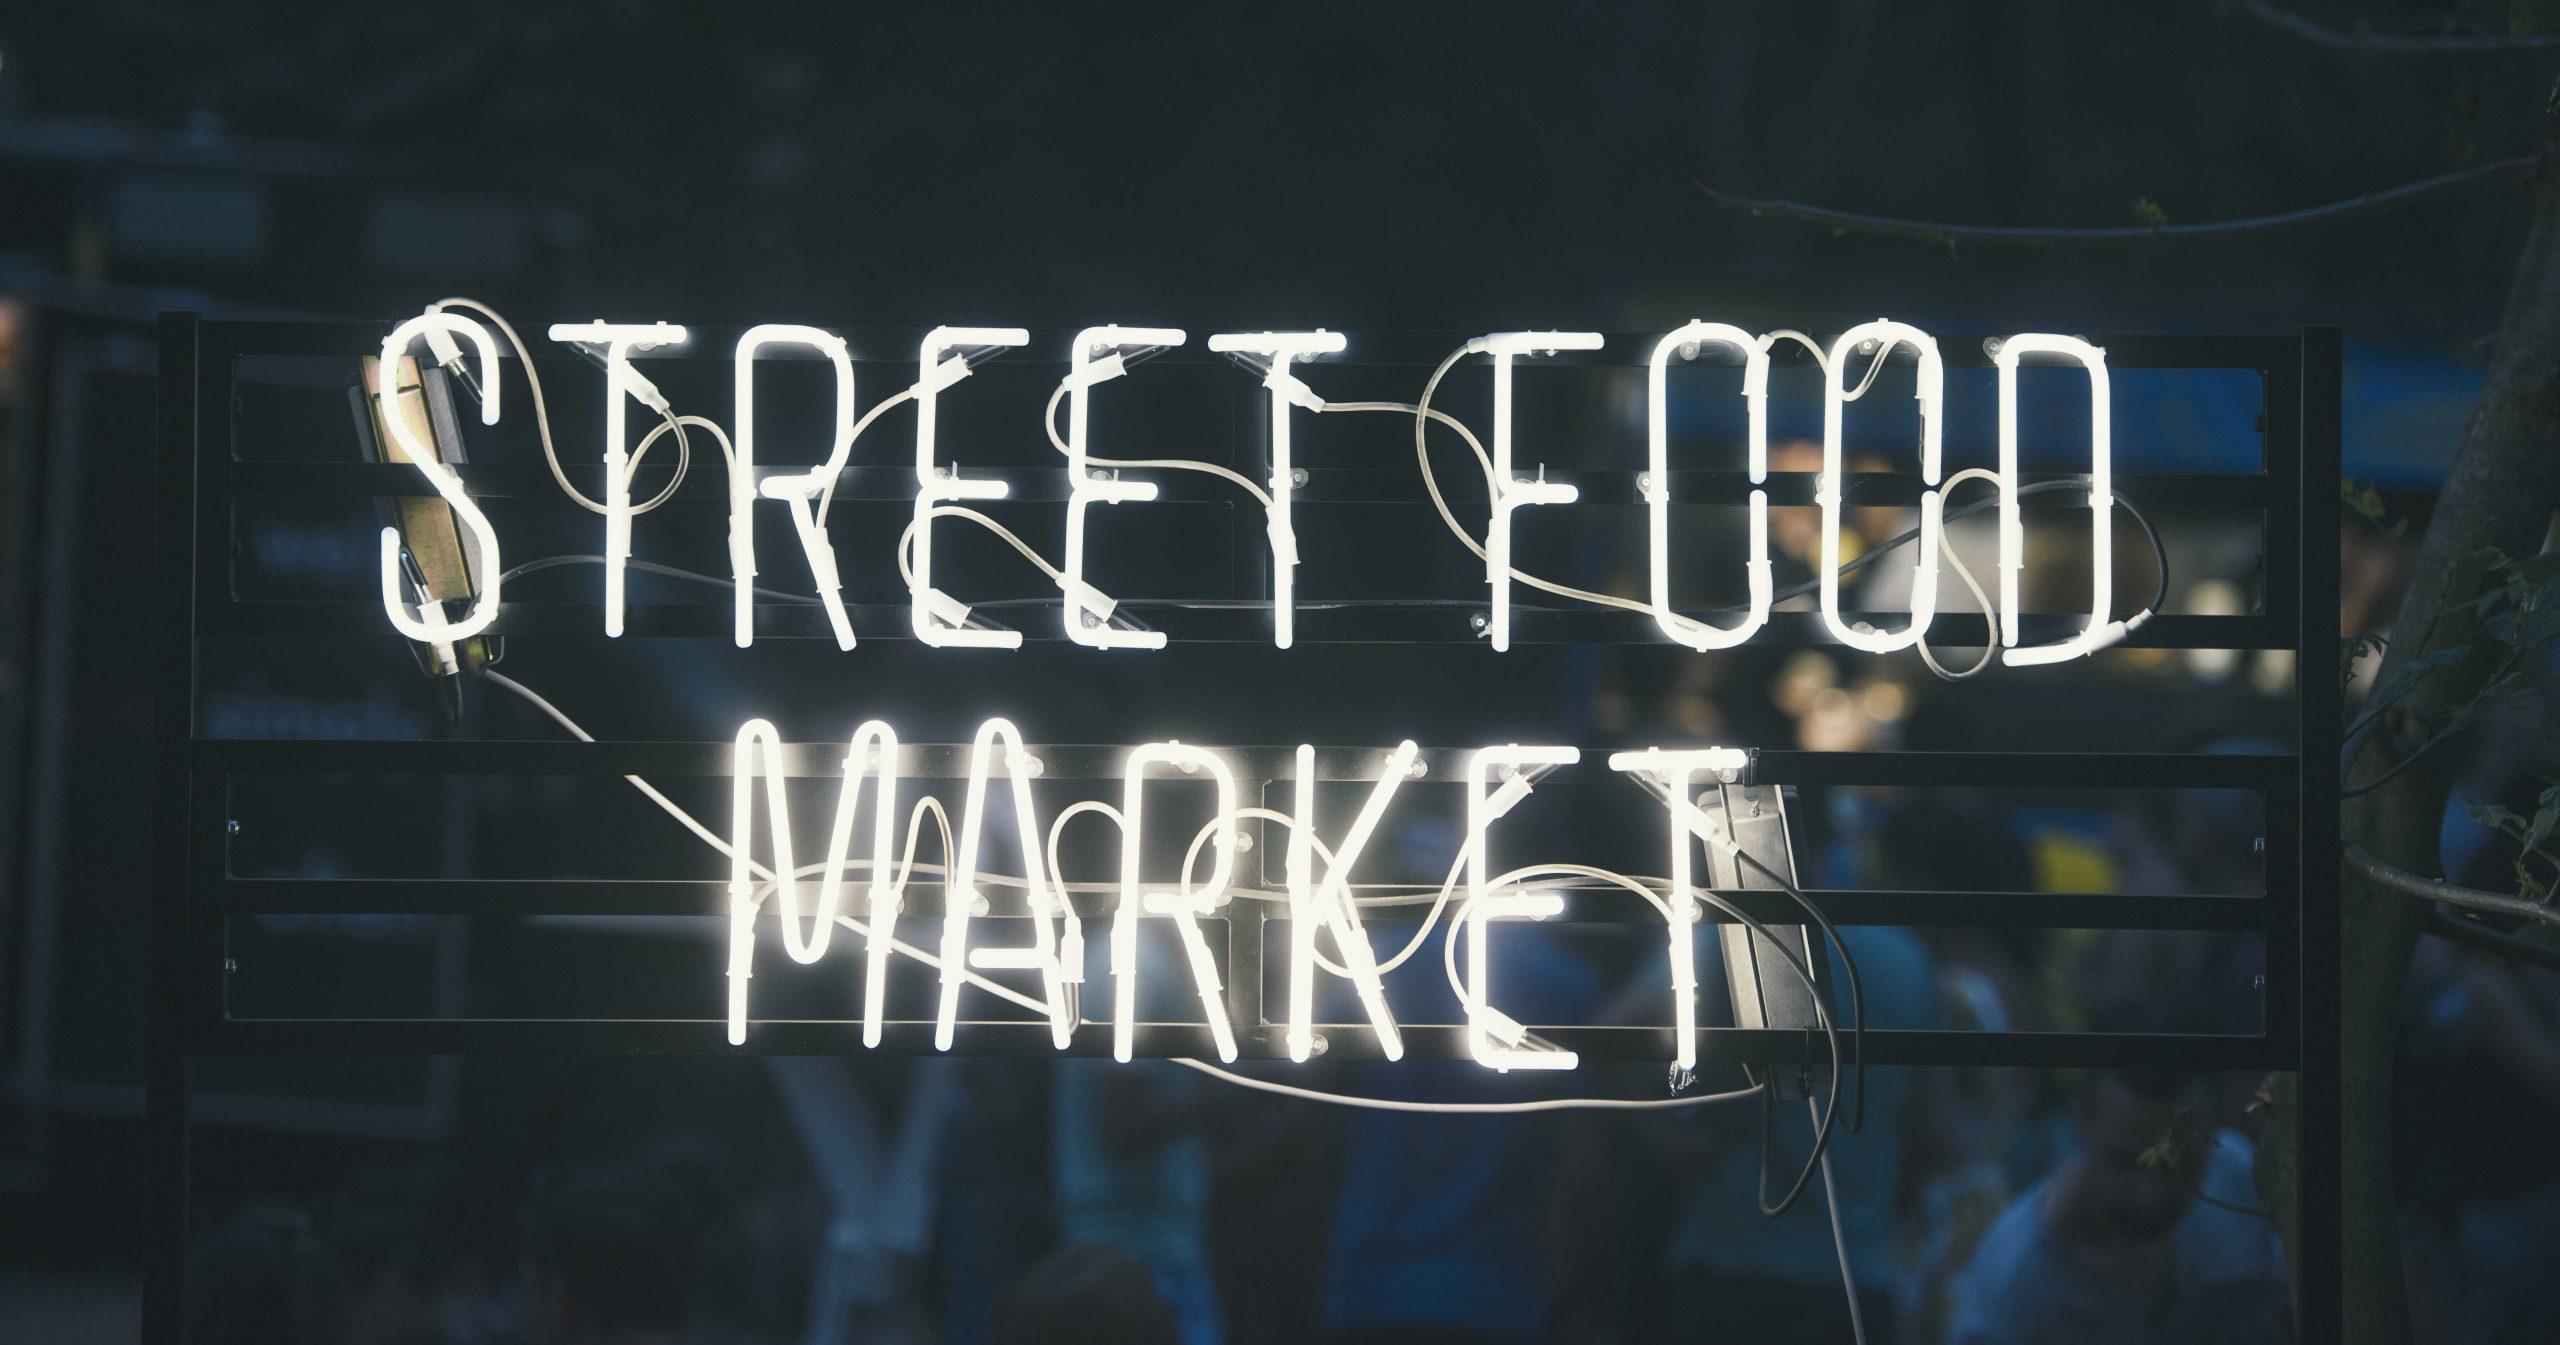 Street food market food trend graphic